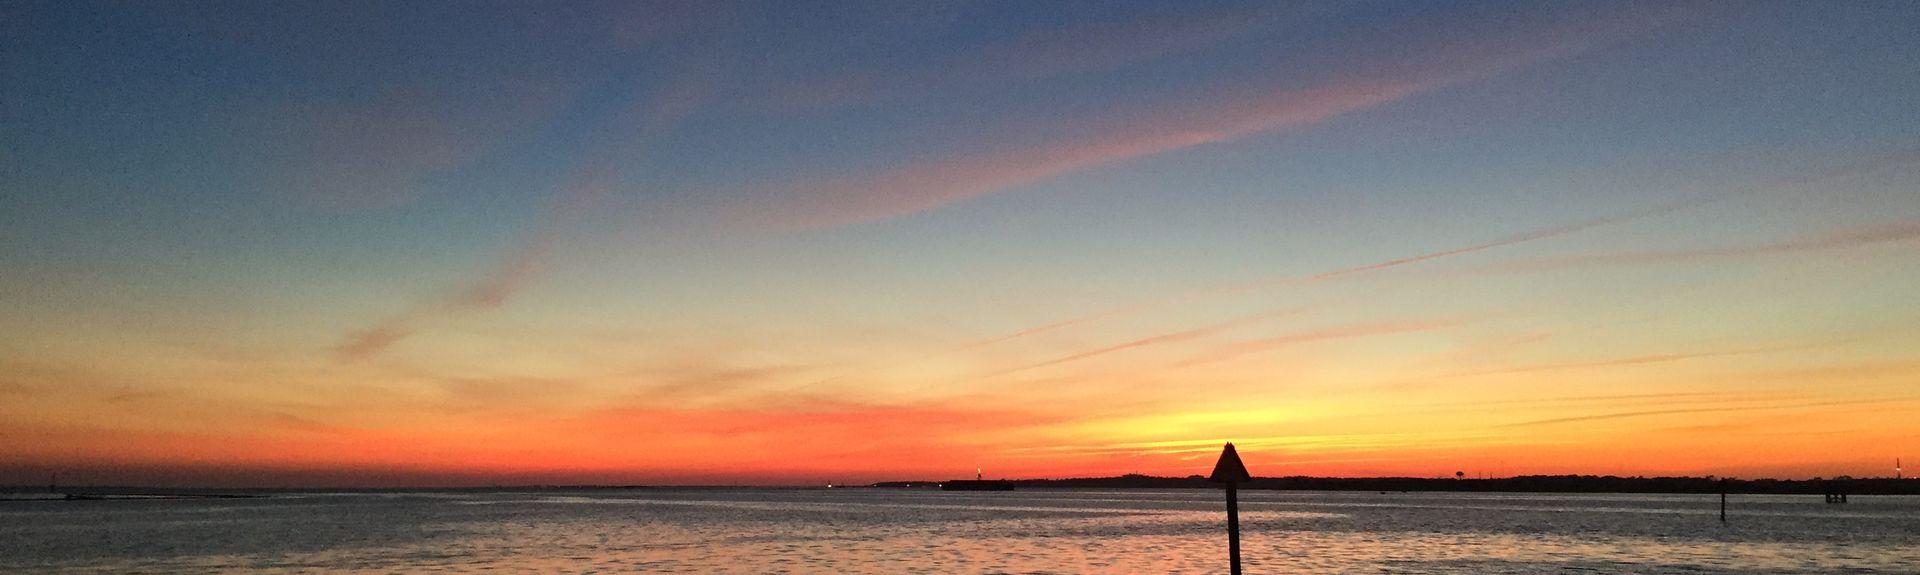 Sea Dunes, Carolina Beach, North Carolina, United States of America